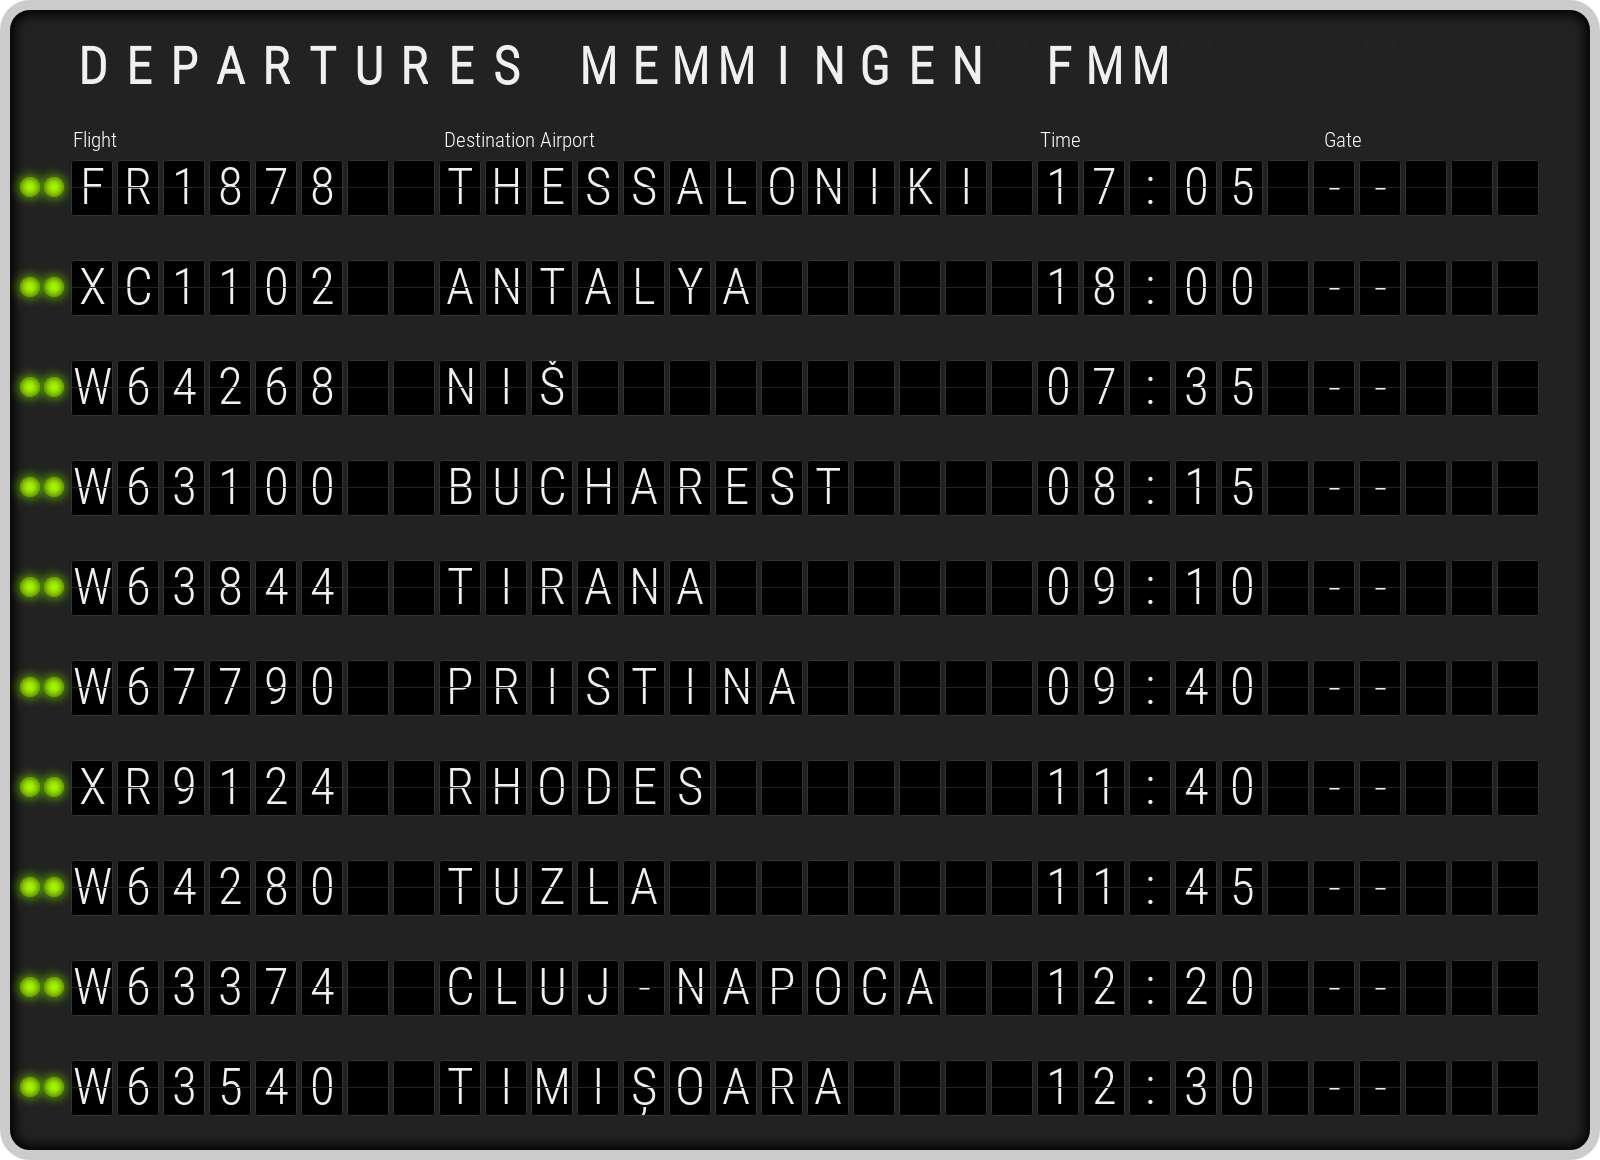 Memmingen departures FMM. Current departure from Memmingen Allgäu, Memmingen Airport